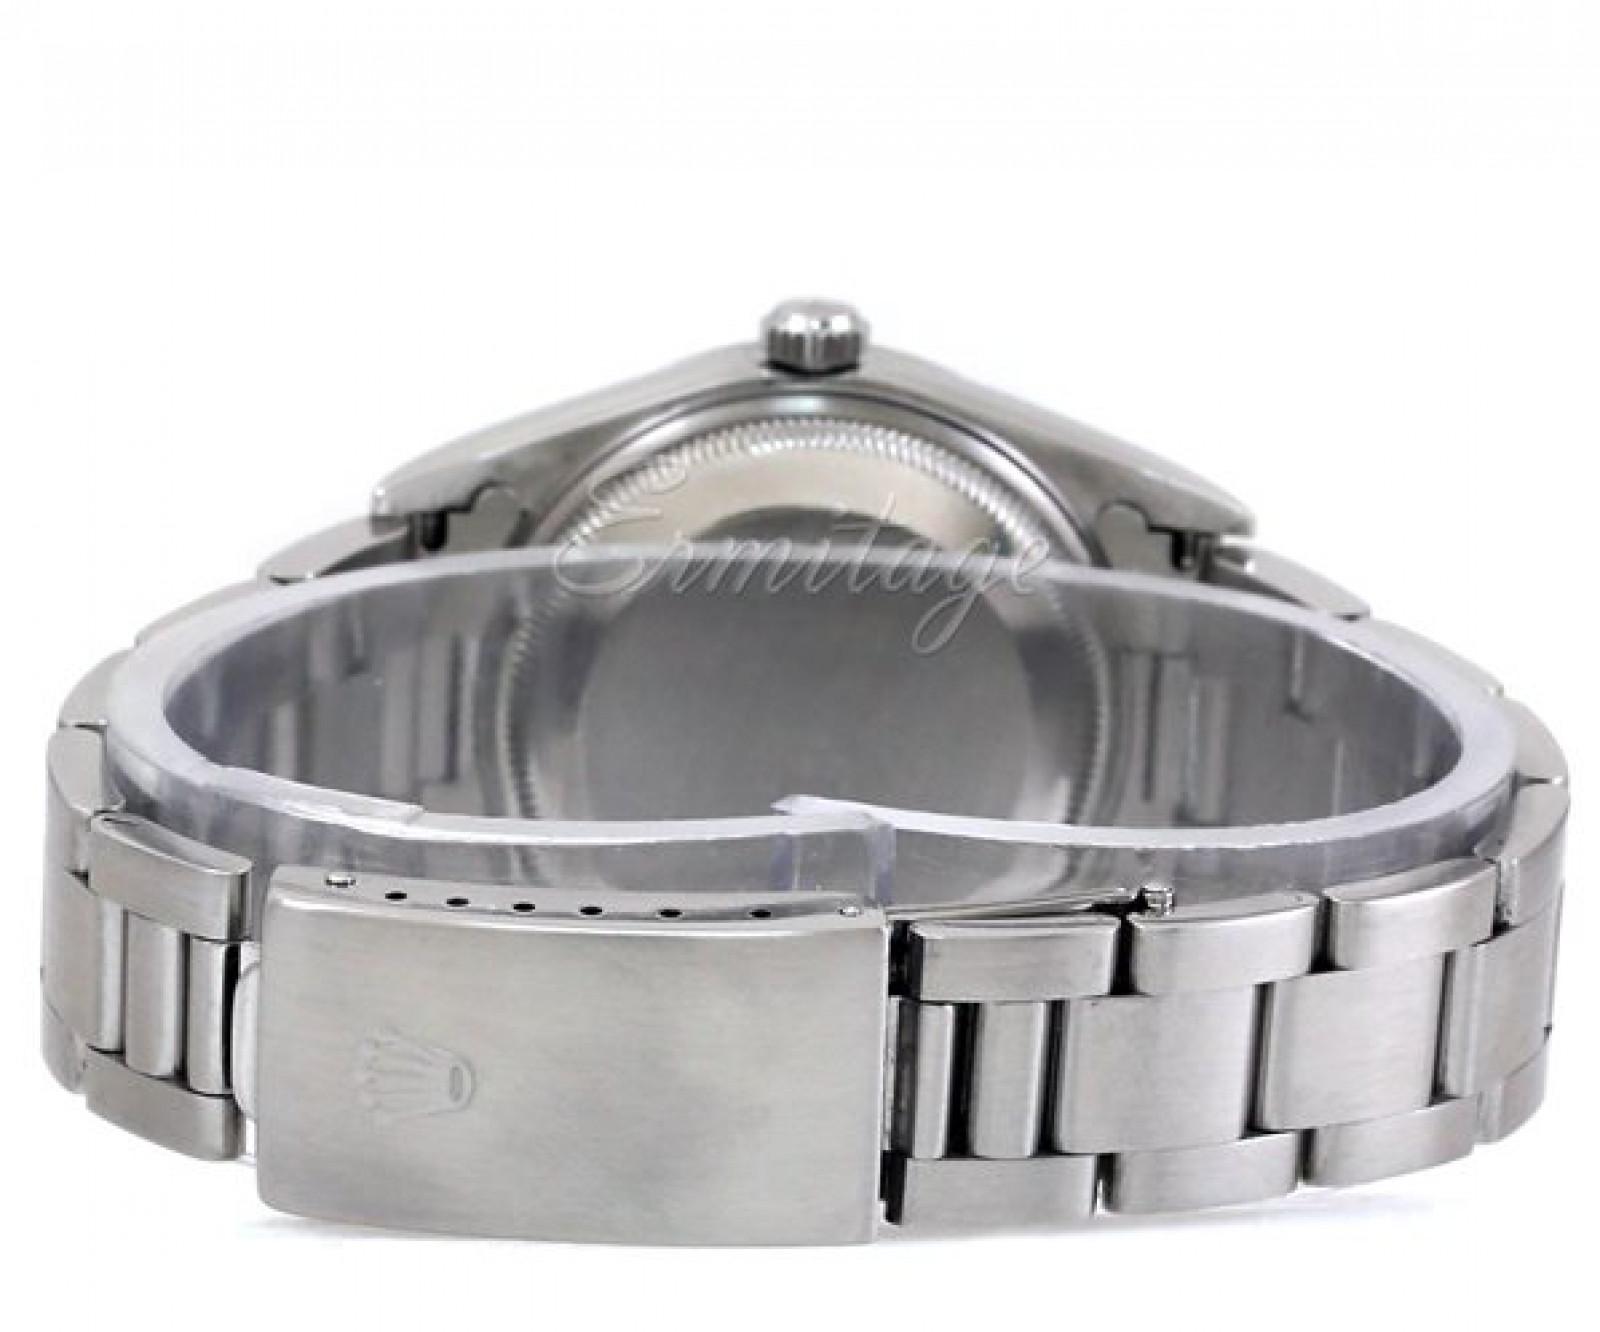 Rolex Date 15200 Steel